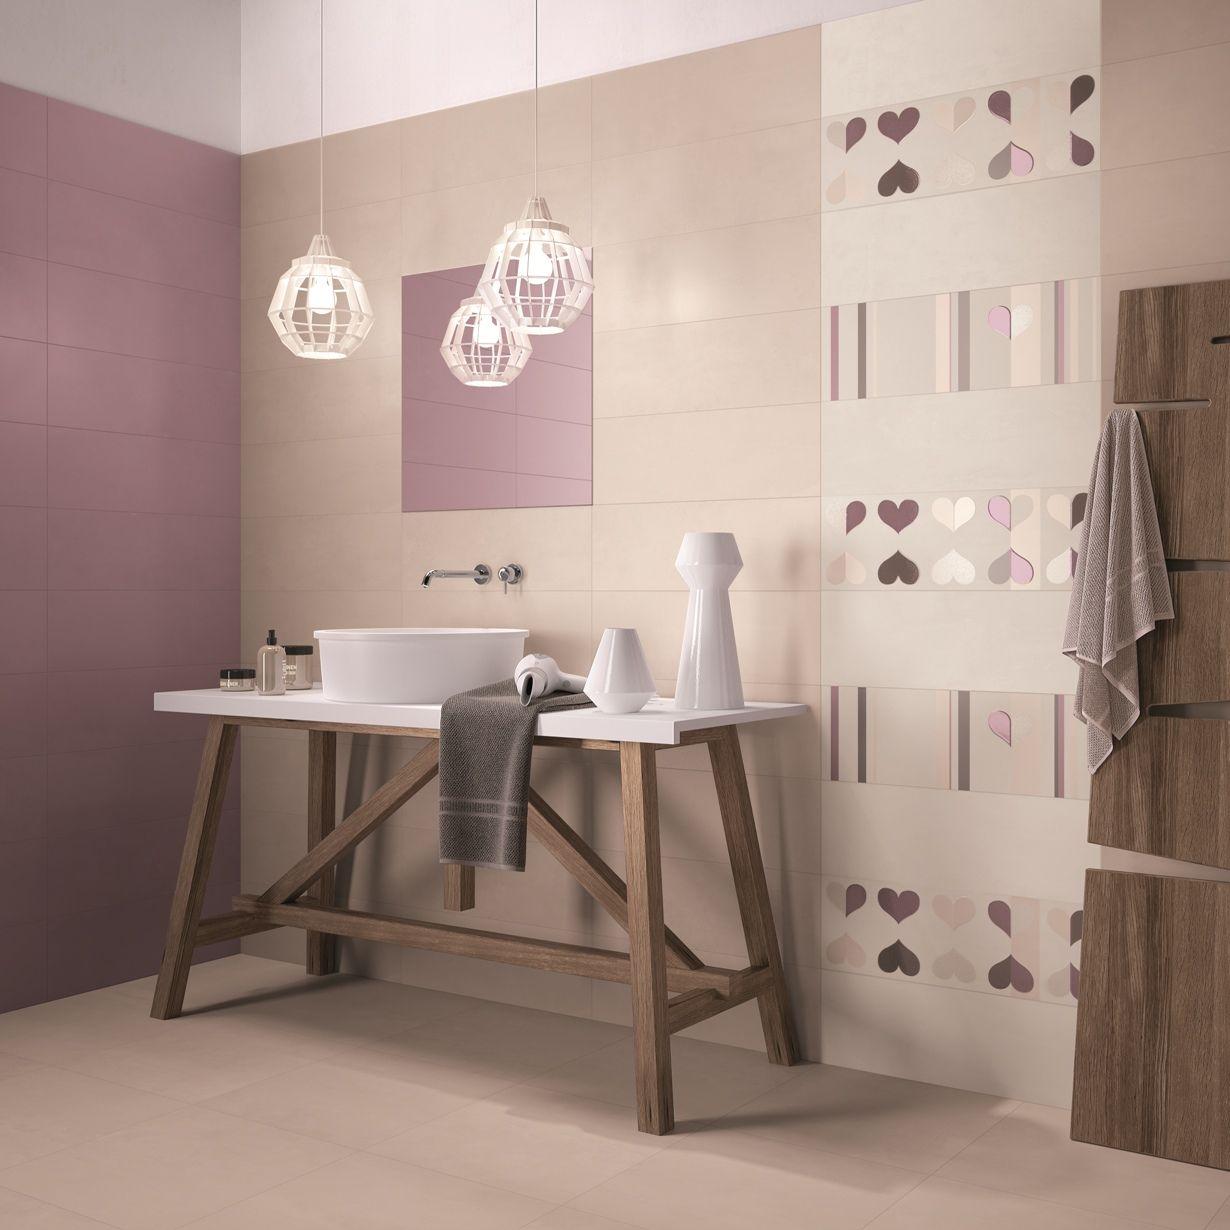 collection vision #abkemozioni #ceramic #tile #homedesign